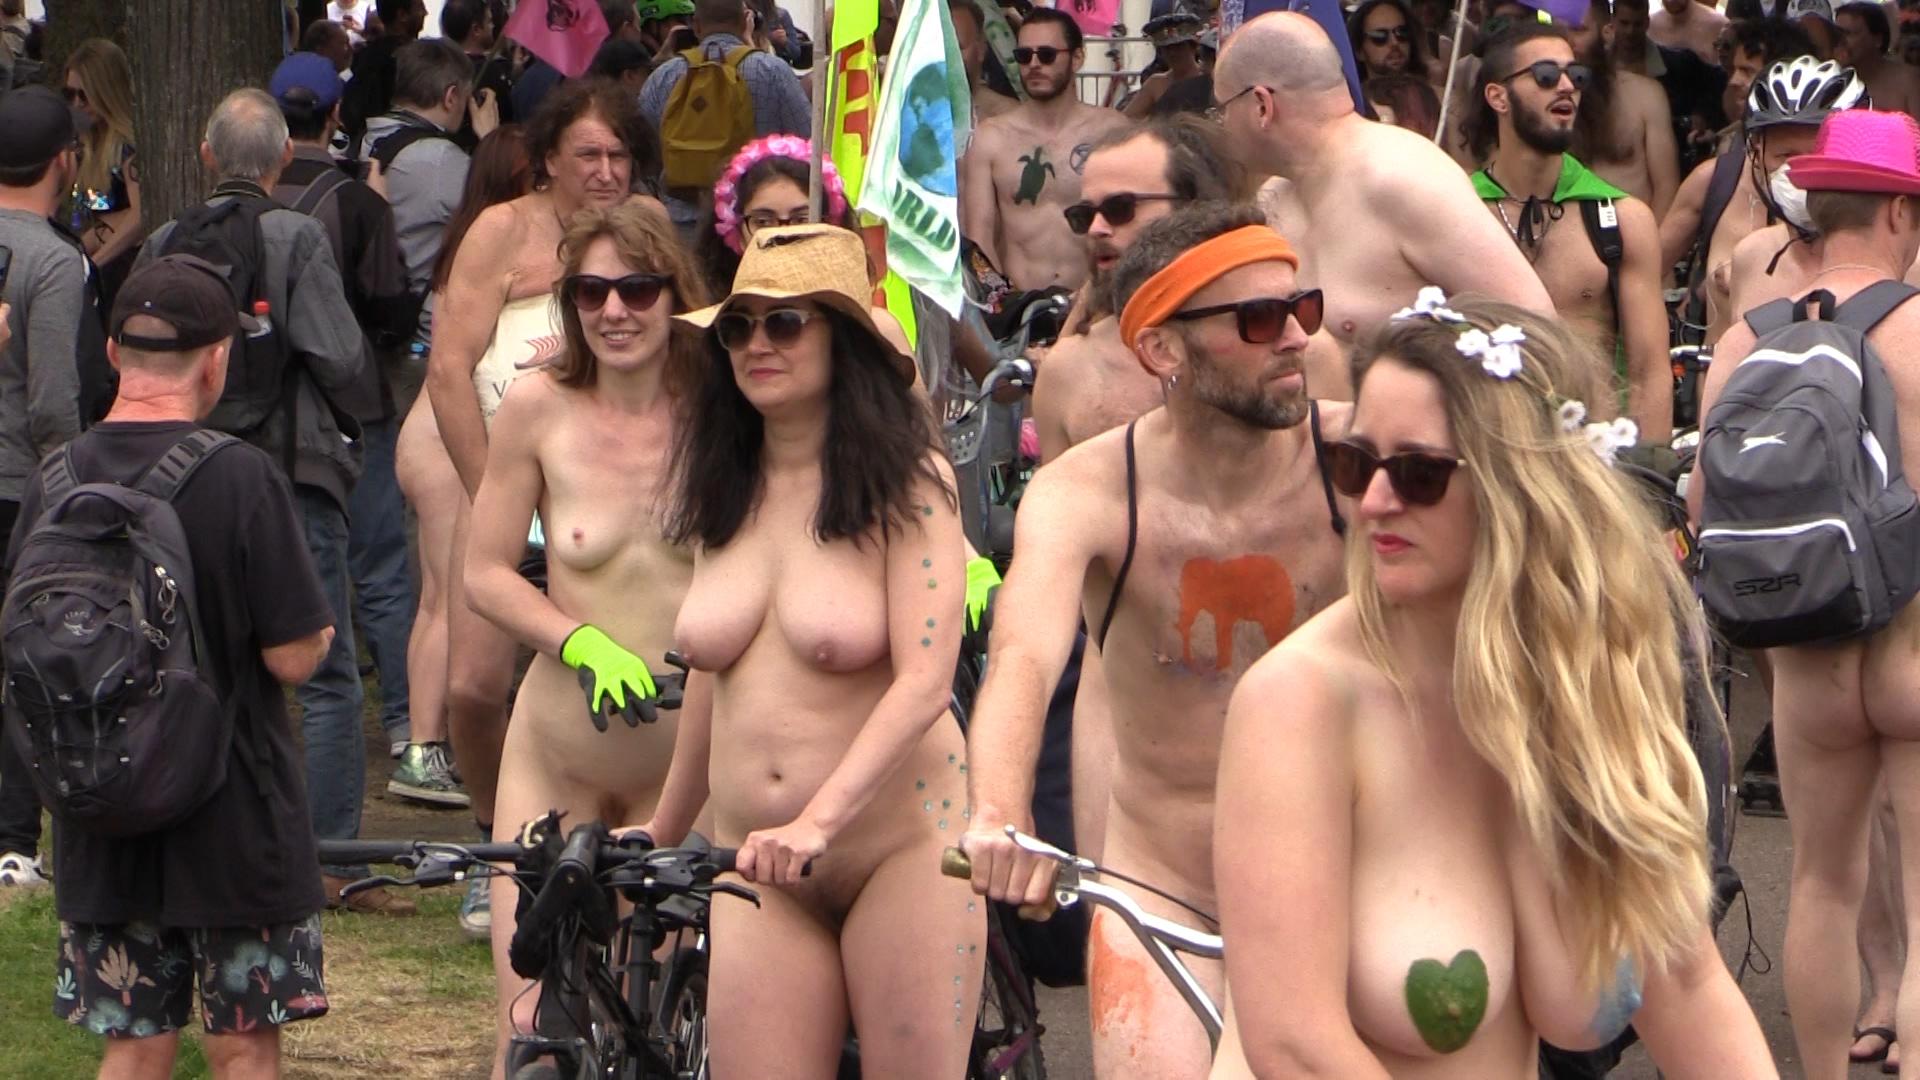 Brighton sharbino walking dead fake nude